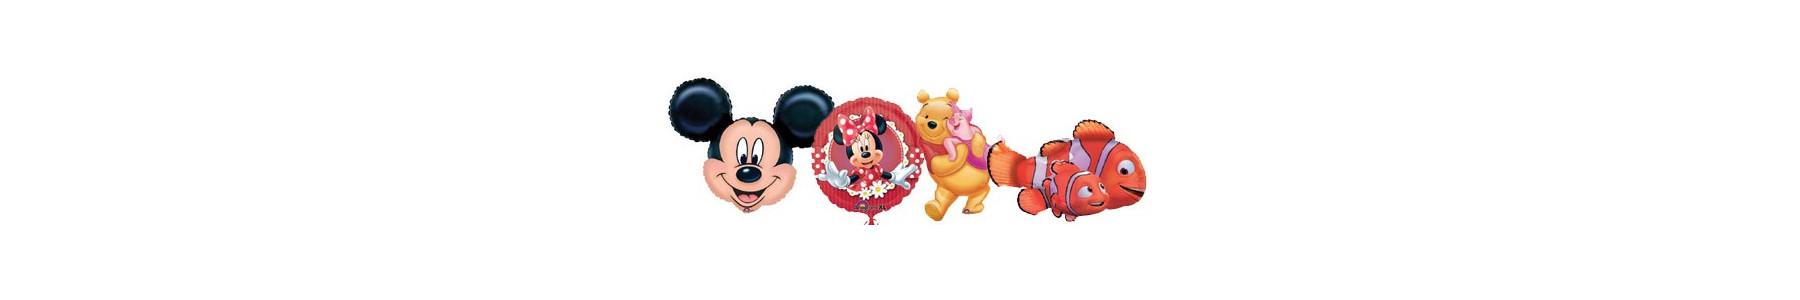 Baloane folie pentru heliu - Baloane cu heliu - Baloane pentru botez - Baloane pentru nunta